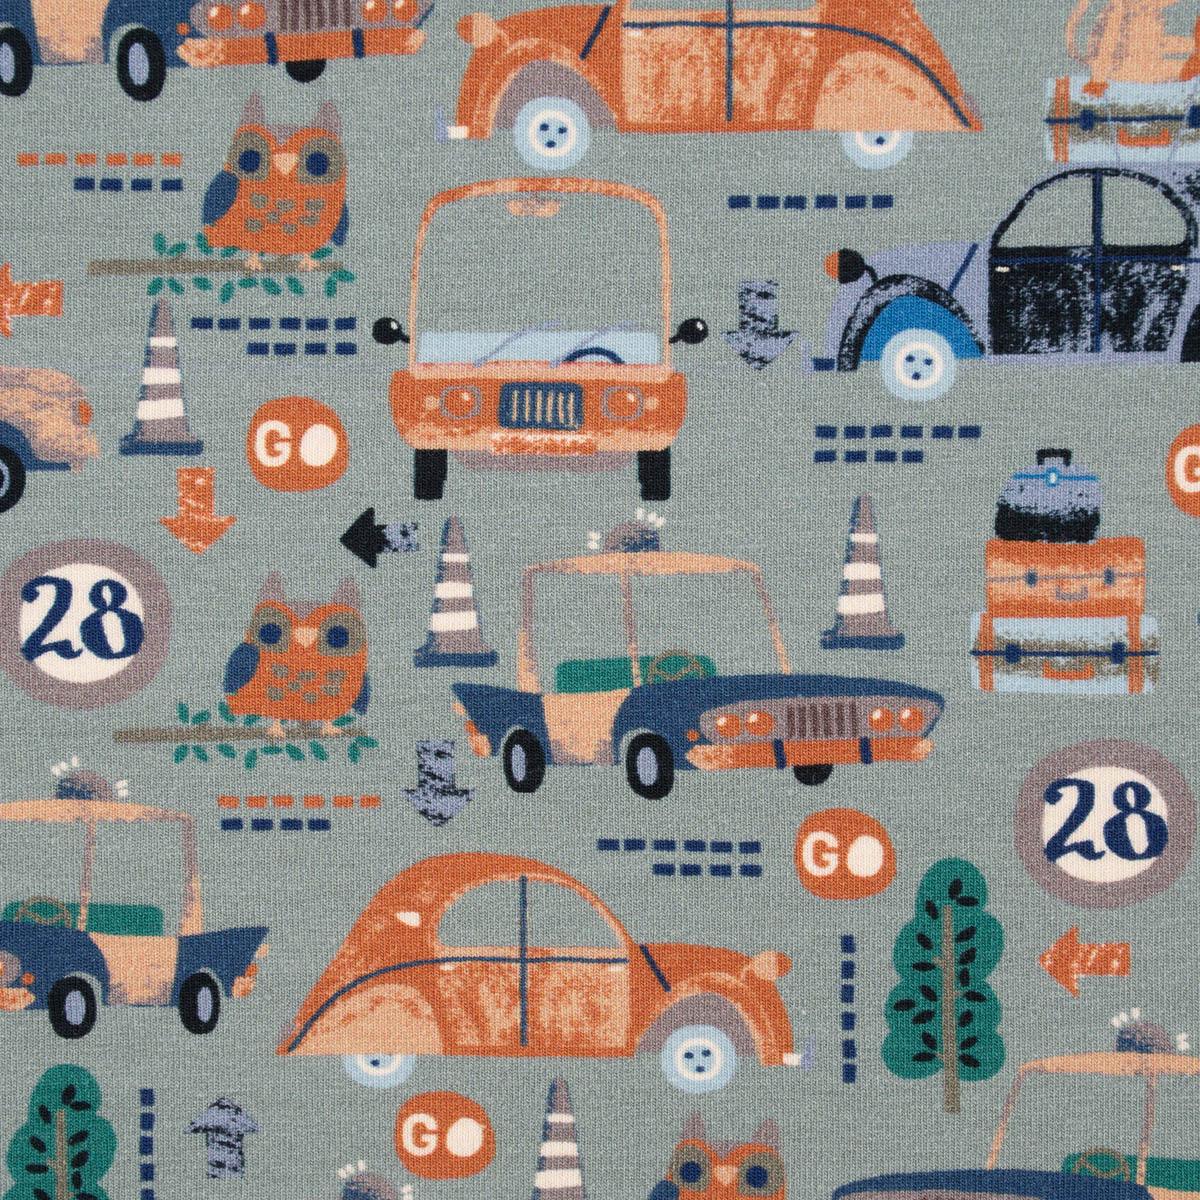 Baumwolljersey Jersey Digitaldruck Autos Eule Affe altgrün rost petrol 1,5m Breite